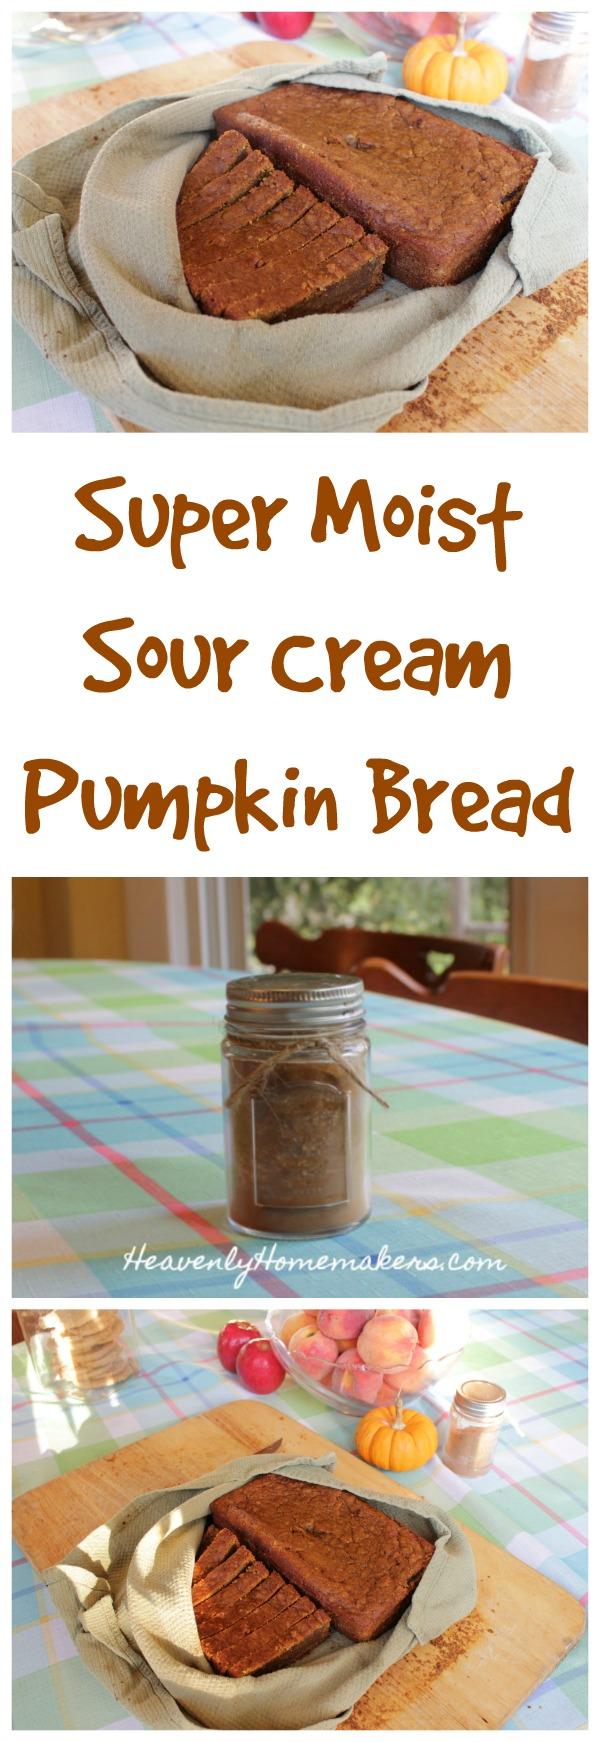 Super Moist Sour Cream Pumpkin Bread